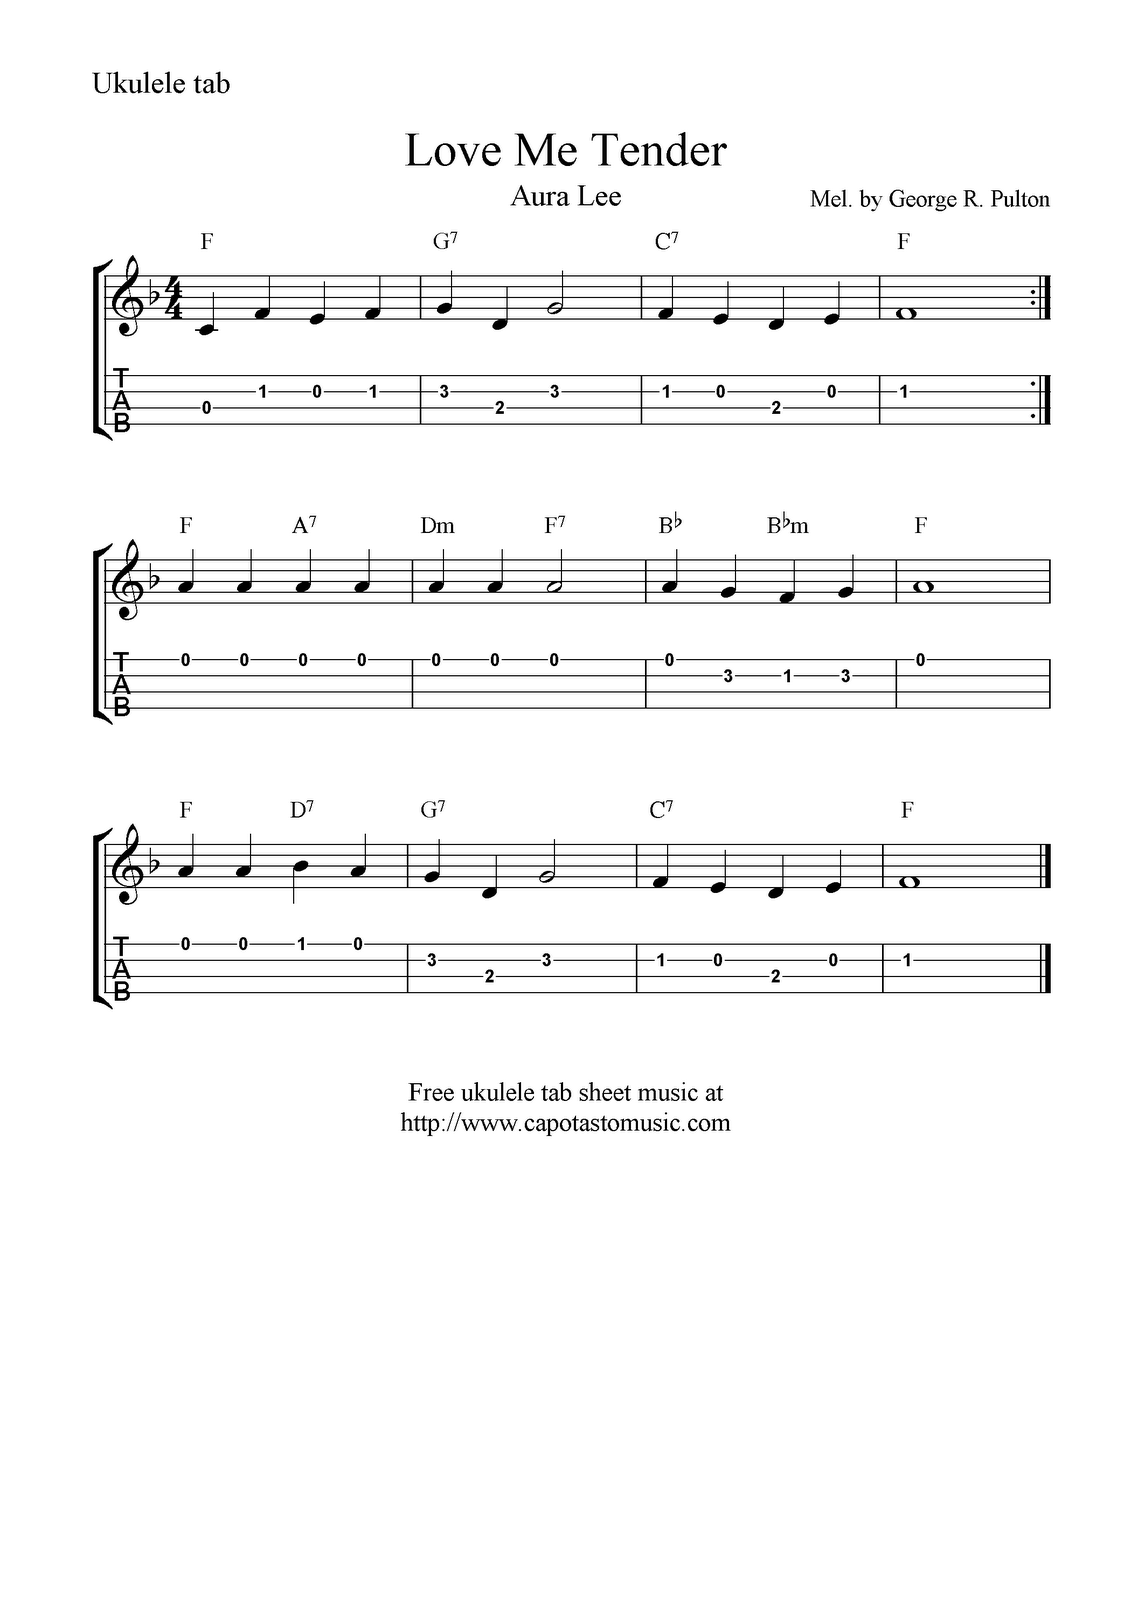 Love Me Tender Aura Lee Ukulele Sheet Music Free Printable